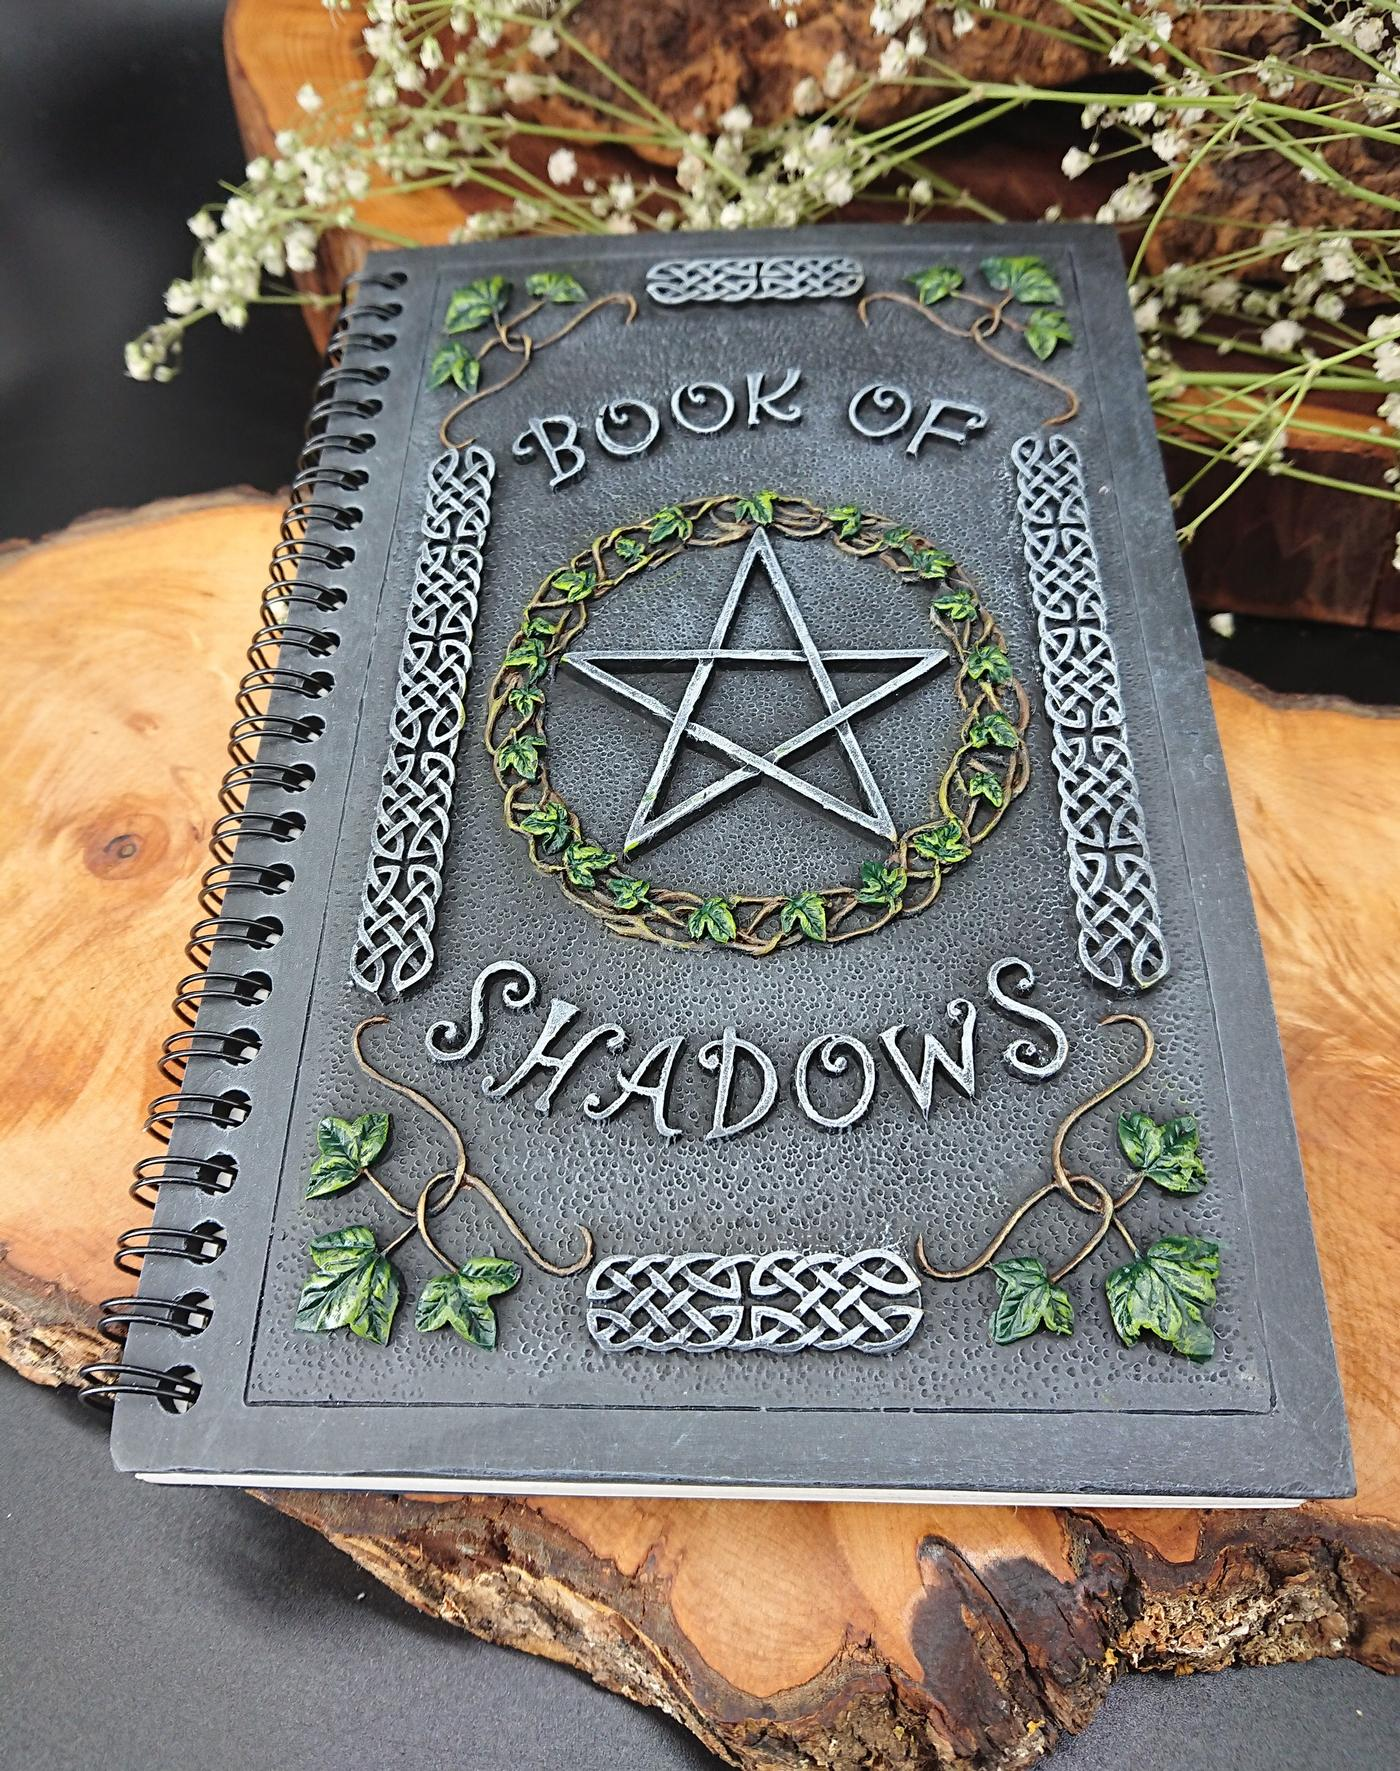 Nemesis Now Ivy Book of Shadows